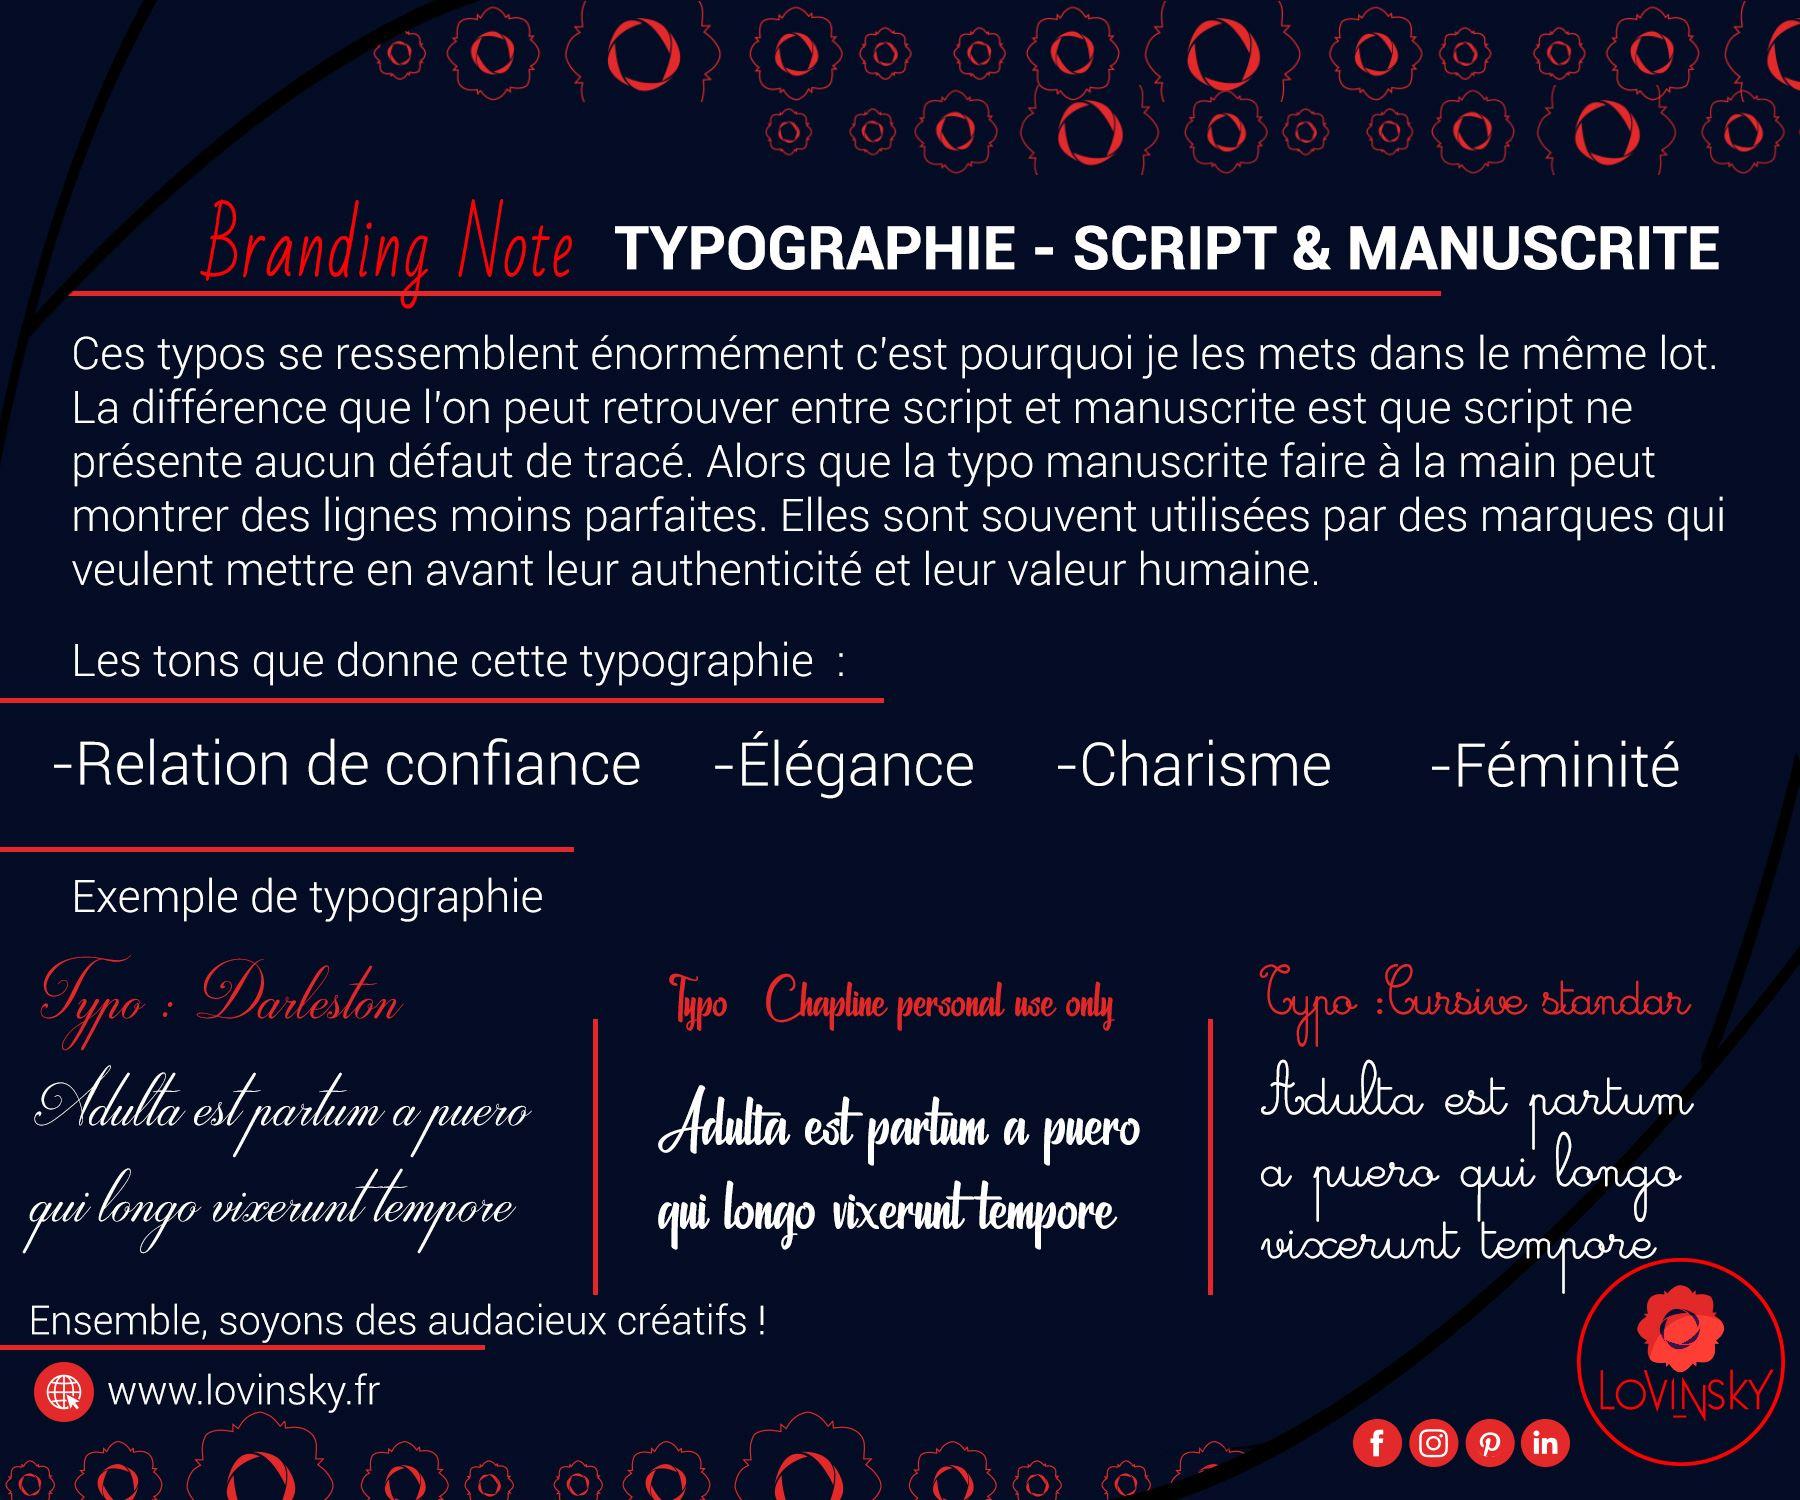 typographie-Script-&-manuscrite branding note par lovinsky graphiste webdesigner à nantes en freelance